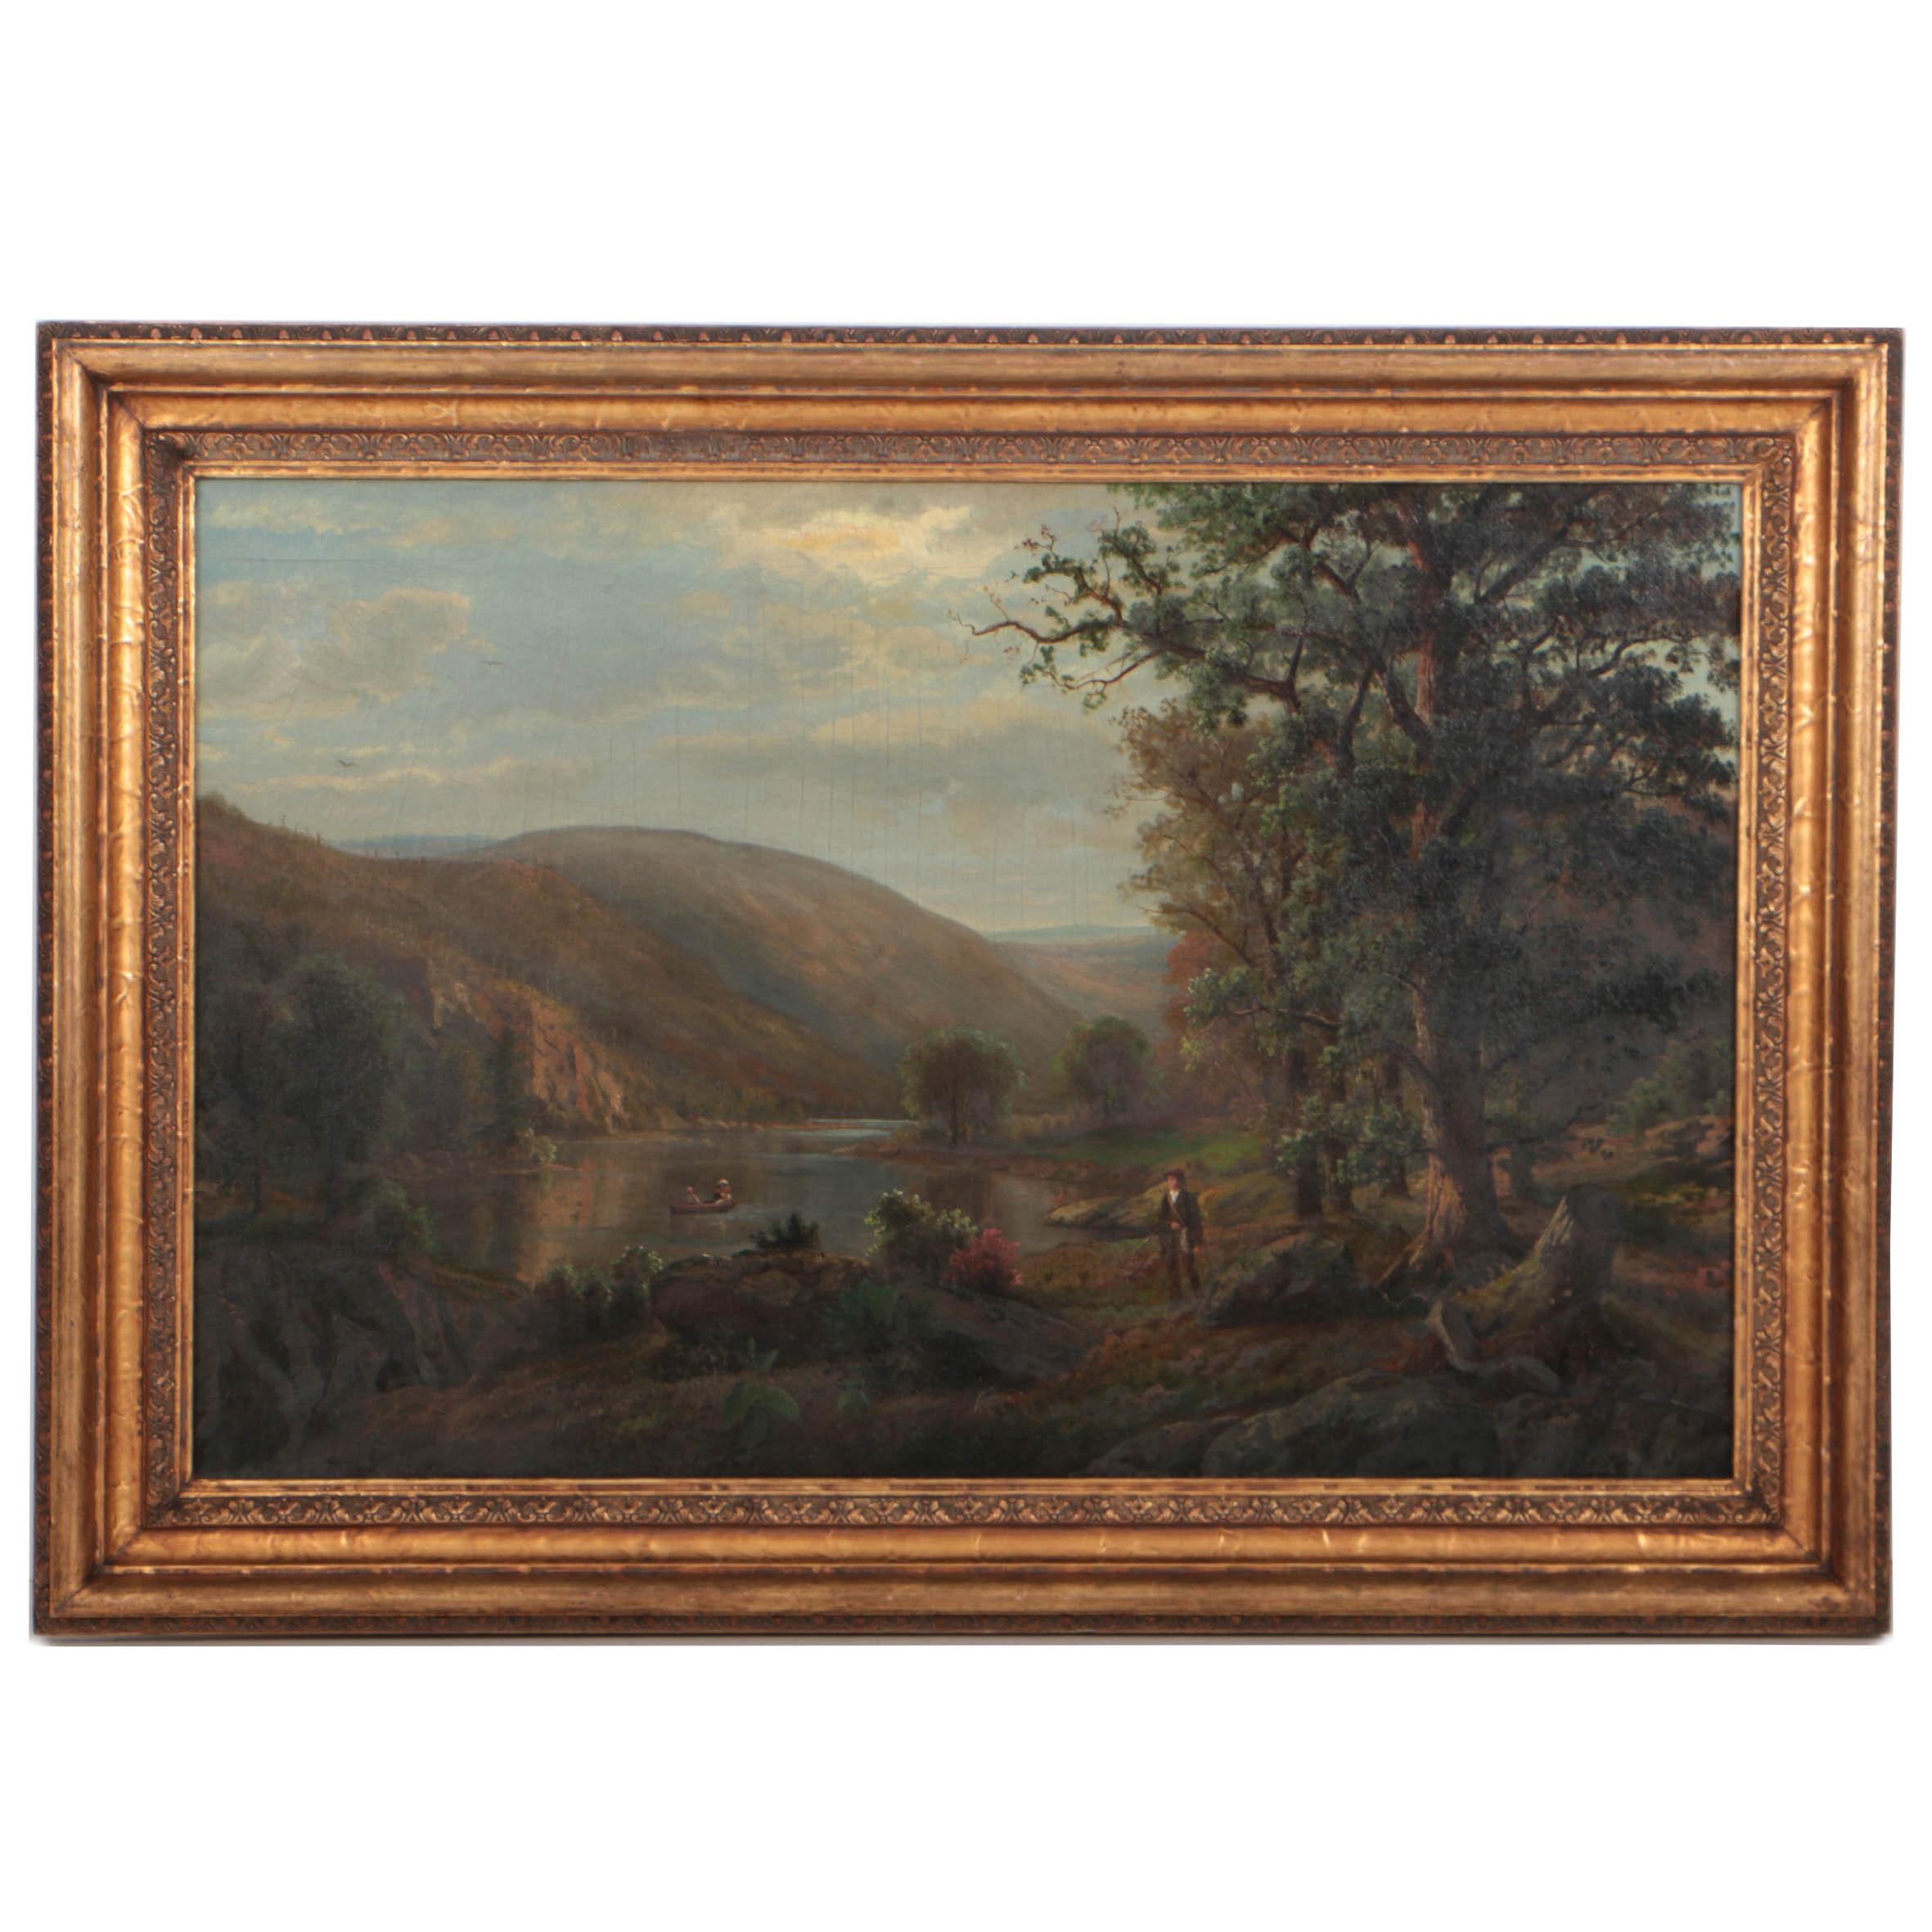 Henry W. Kemper 1881 Romantic Landscape